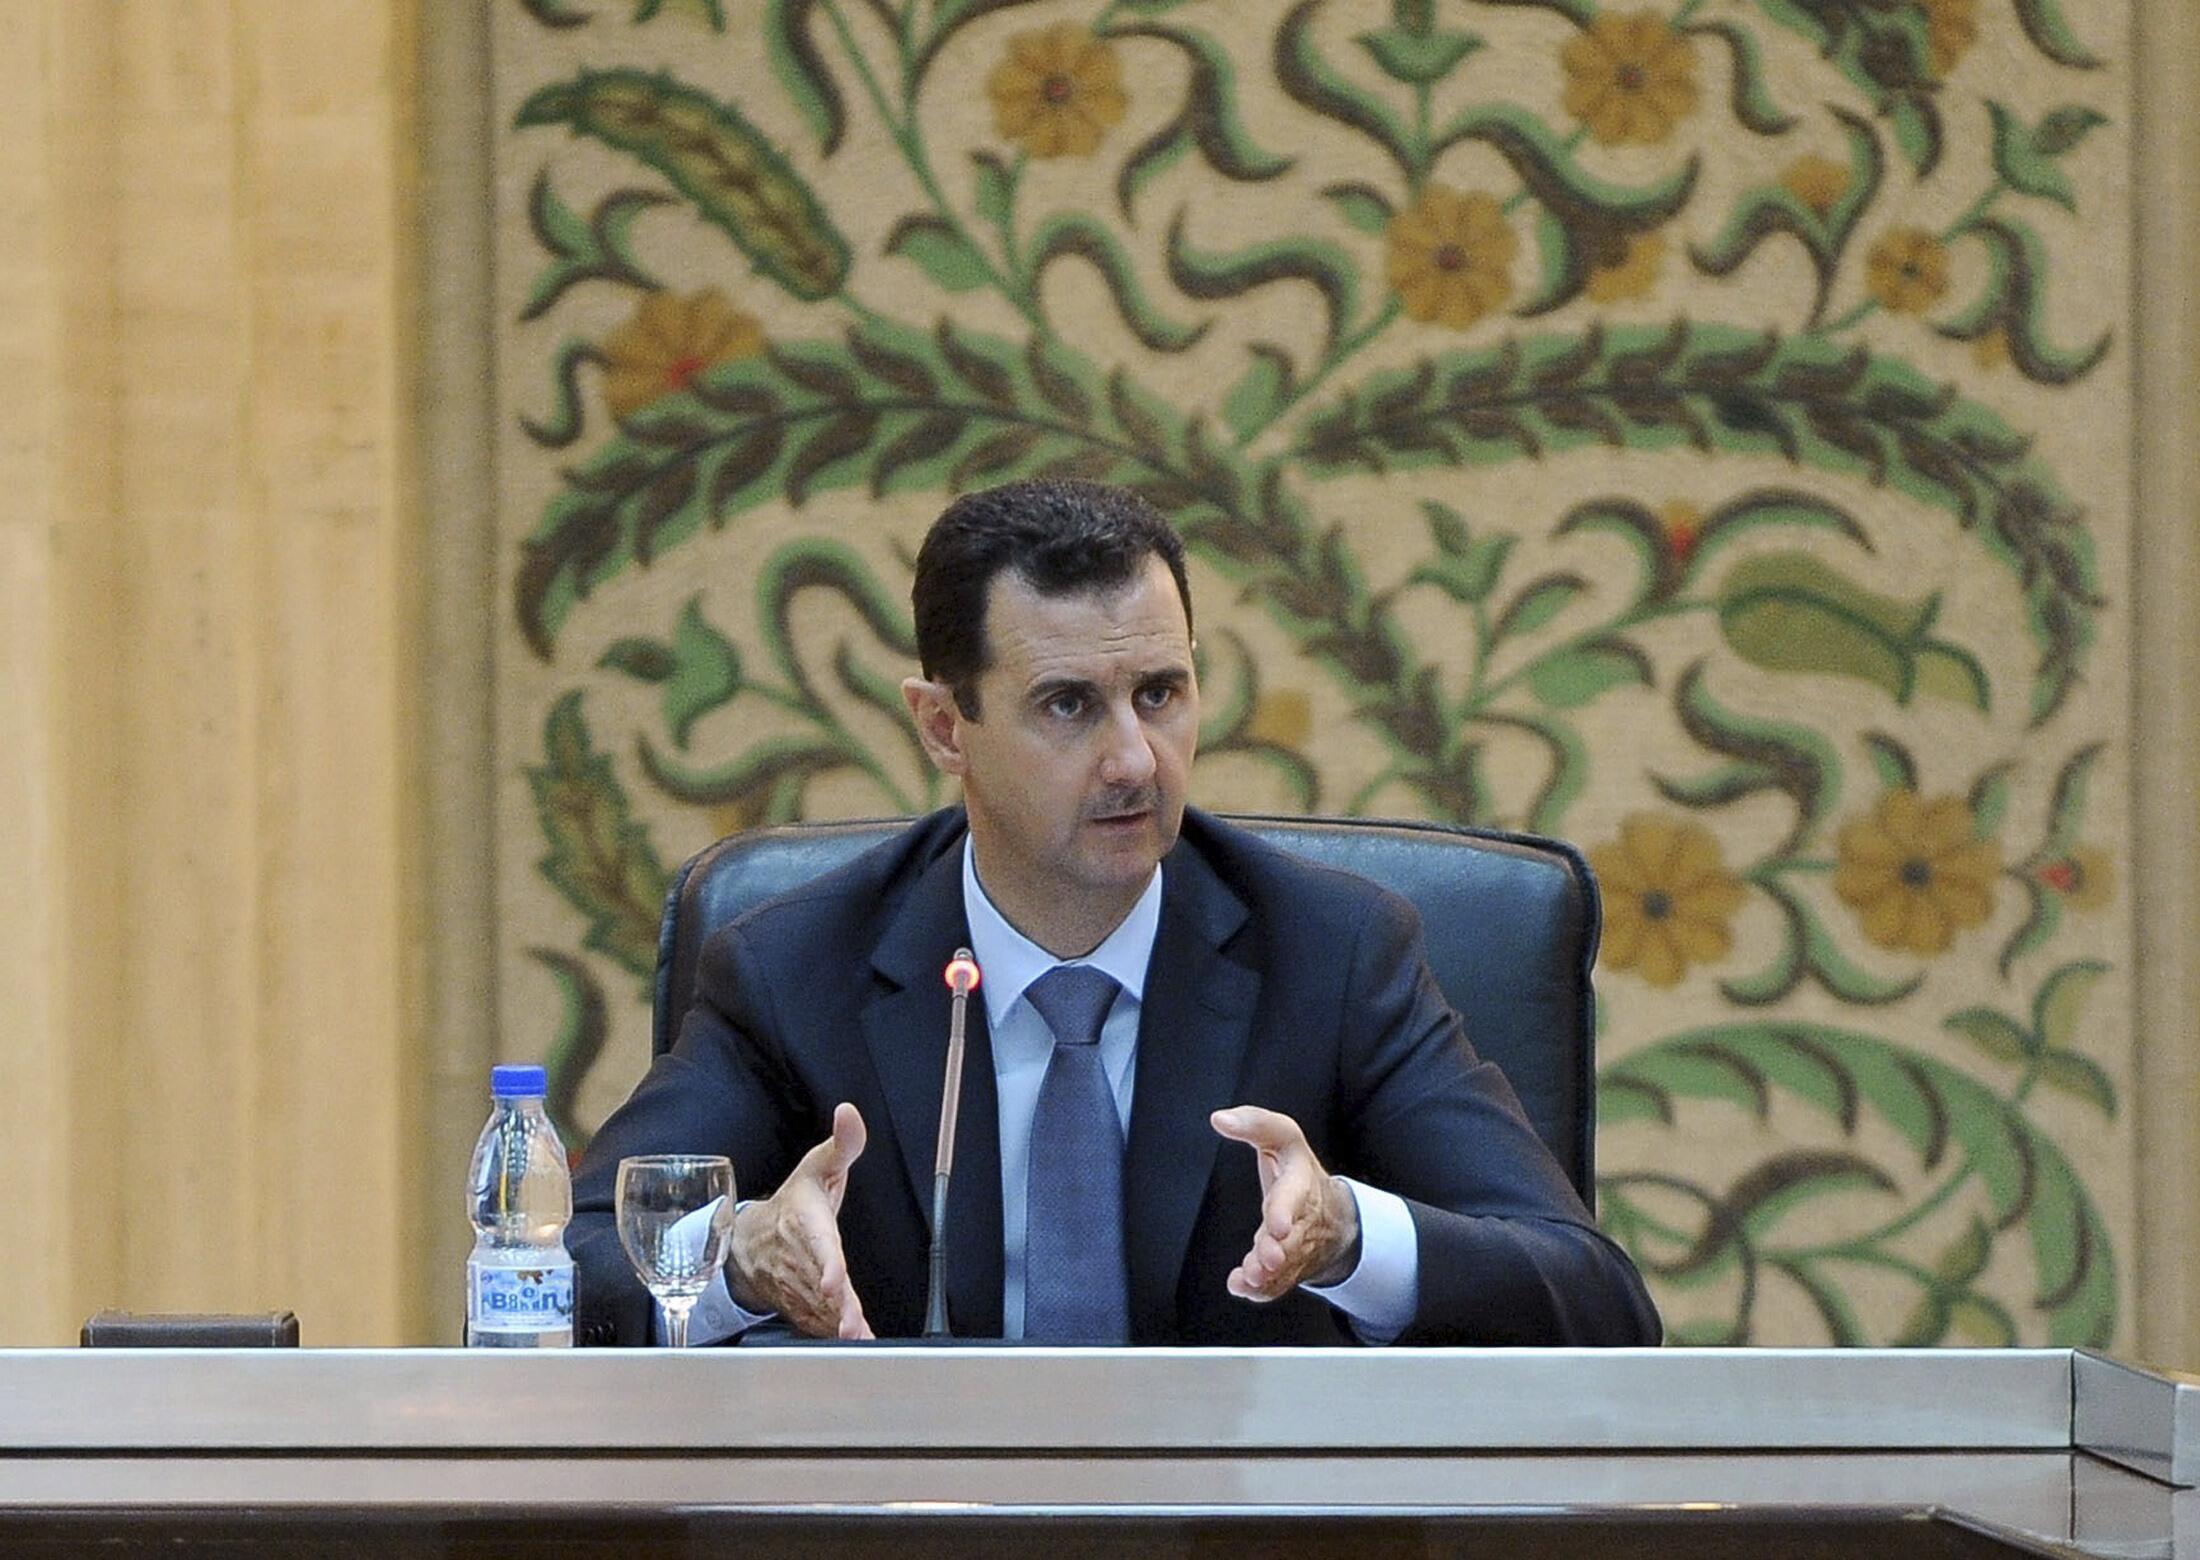 Bashar al-Assad speaks to the new government in Damascus, 26 June, 2012